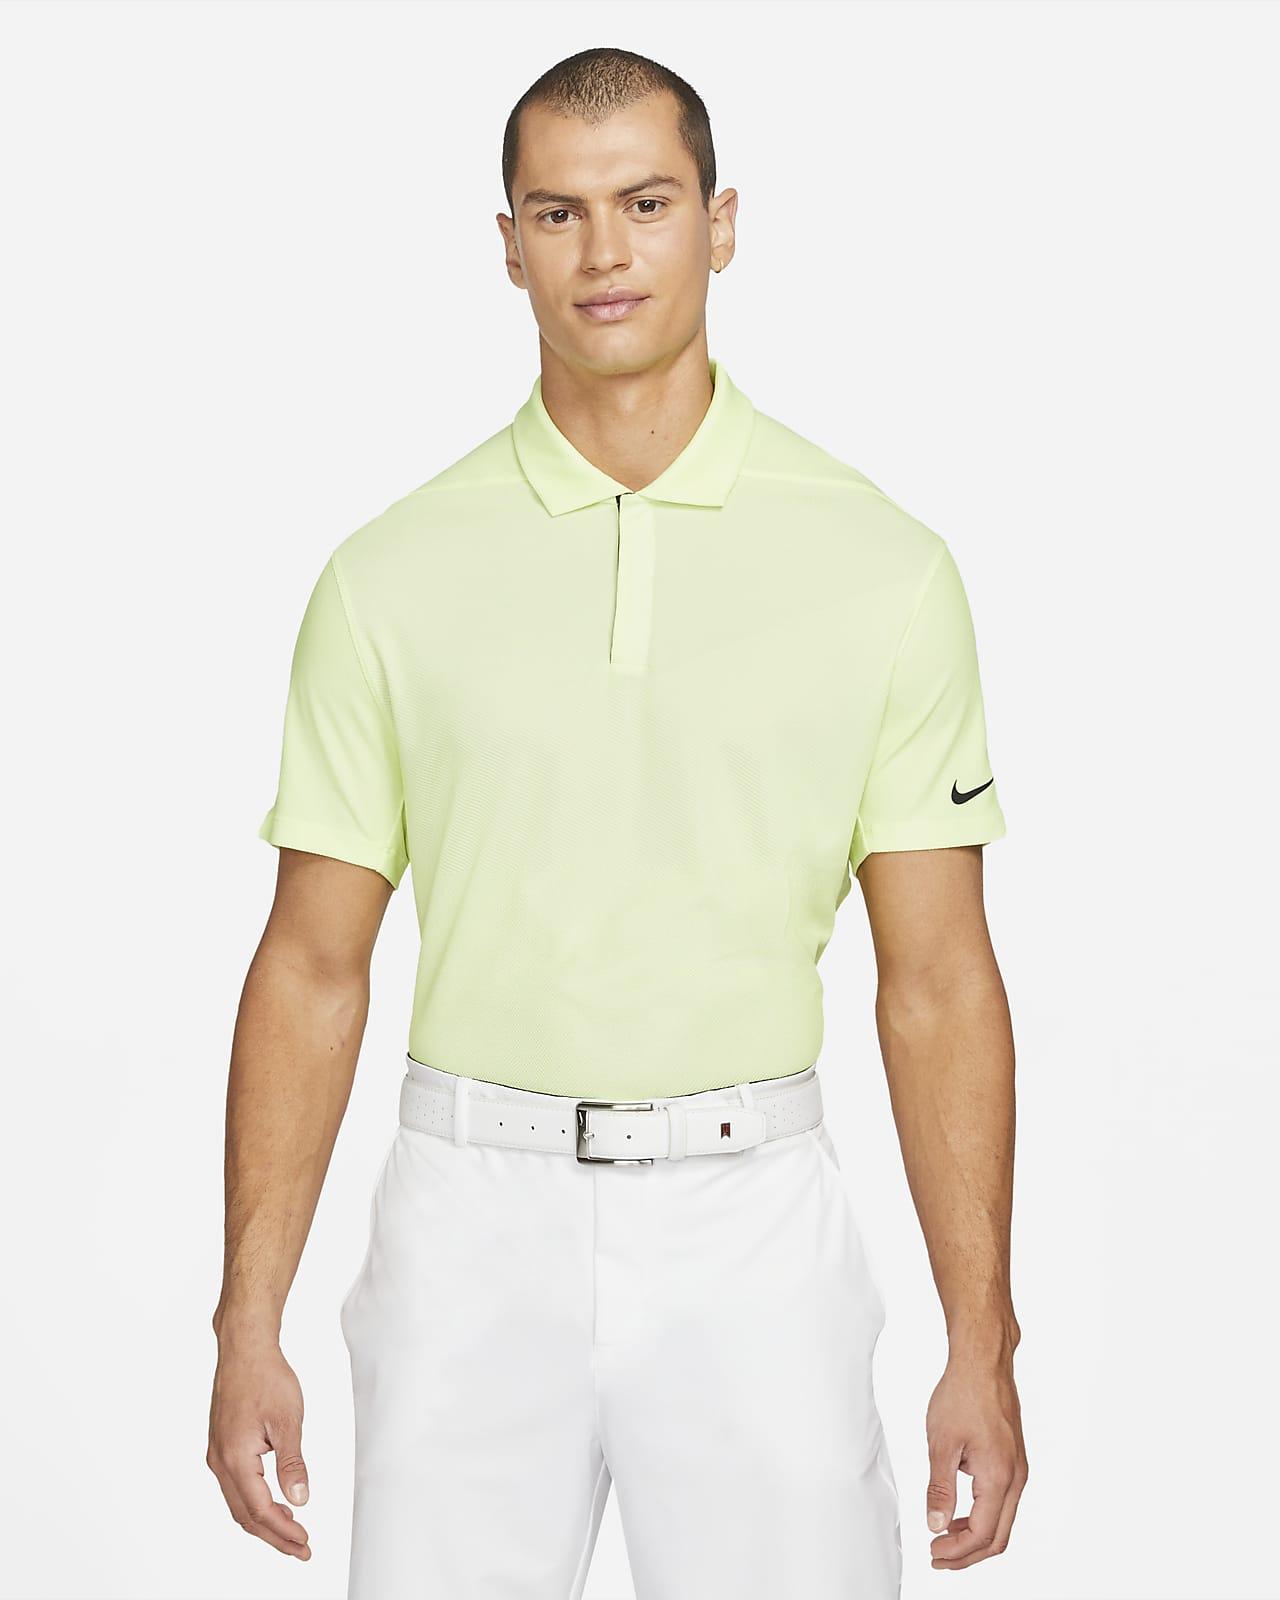 Nike Dri-FIT ADV Tiger Woods Men's Golf Polo